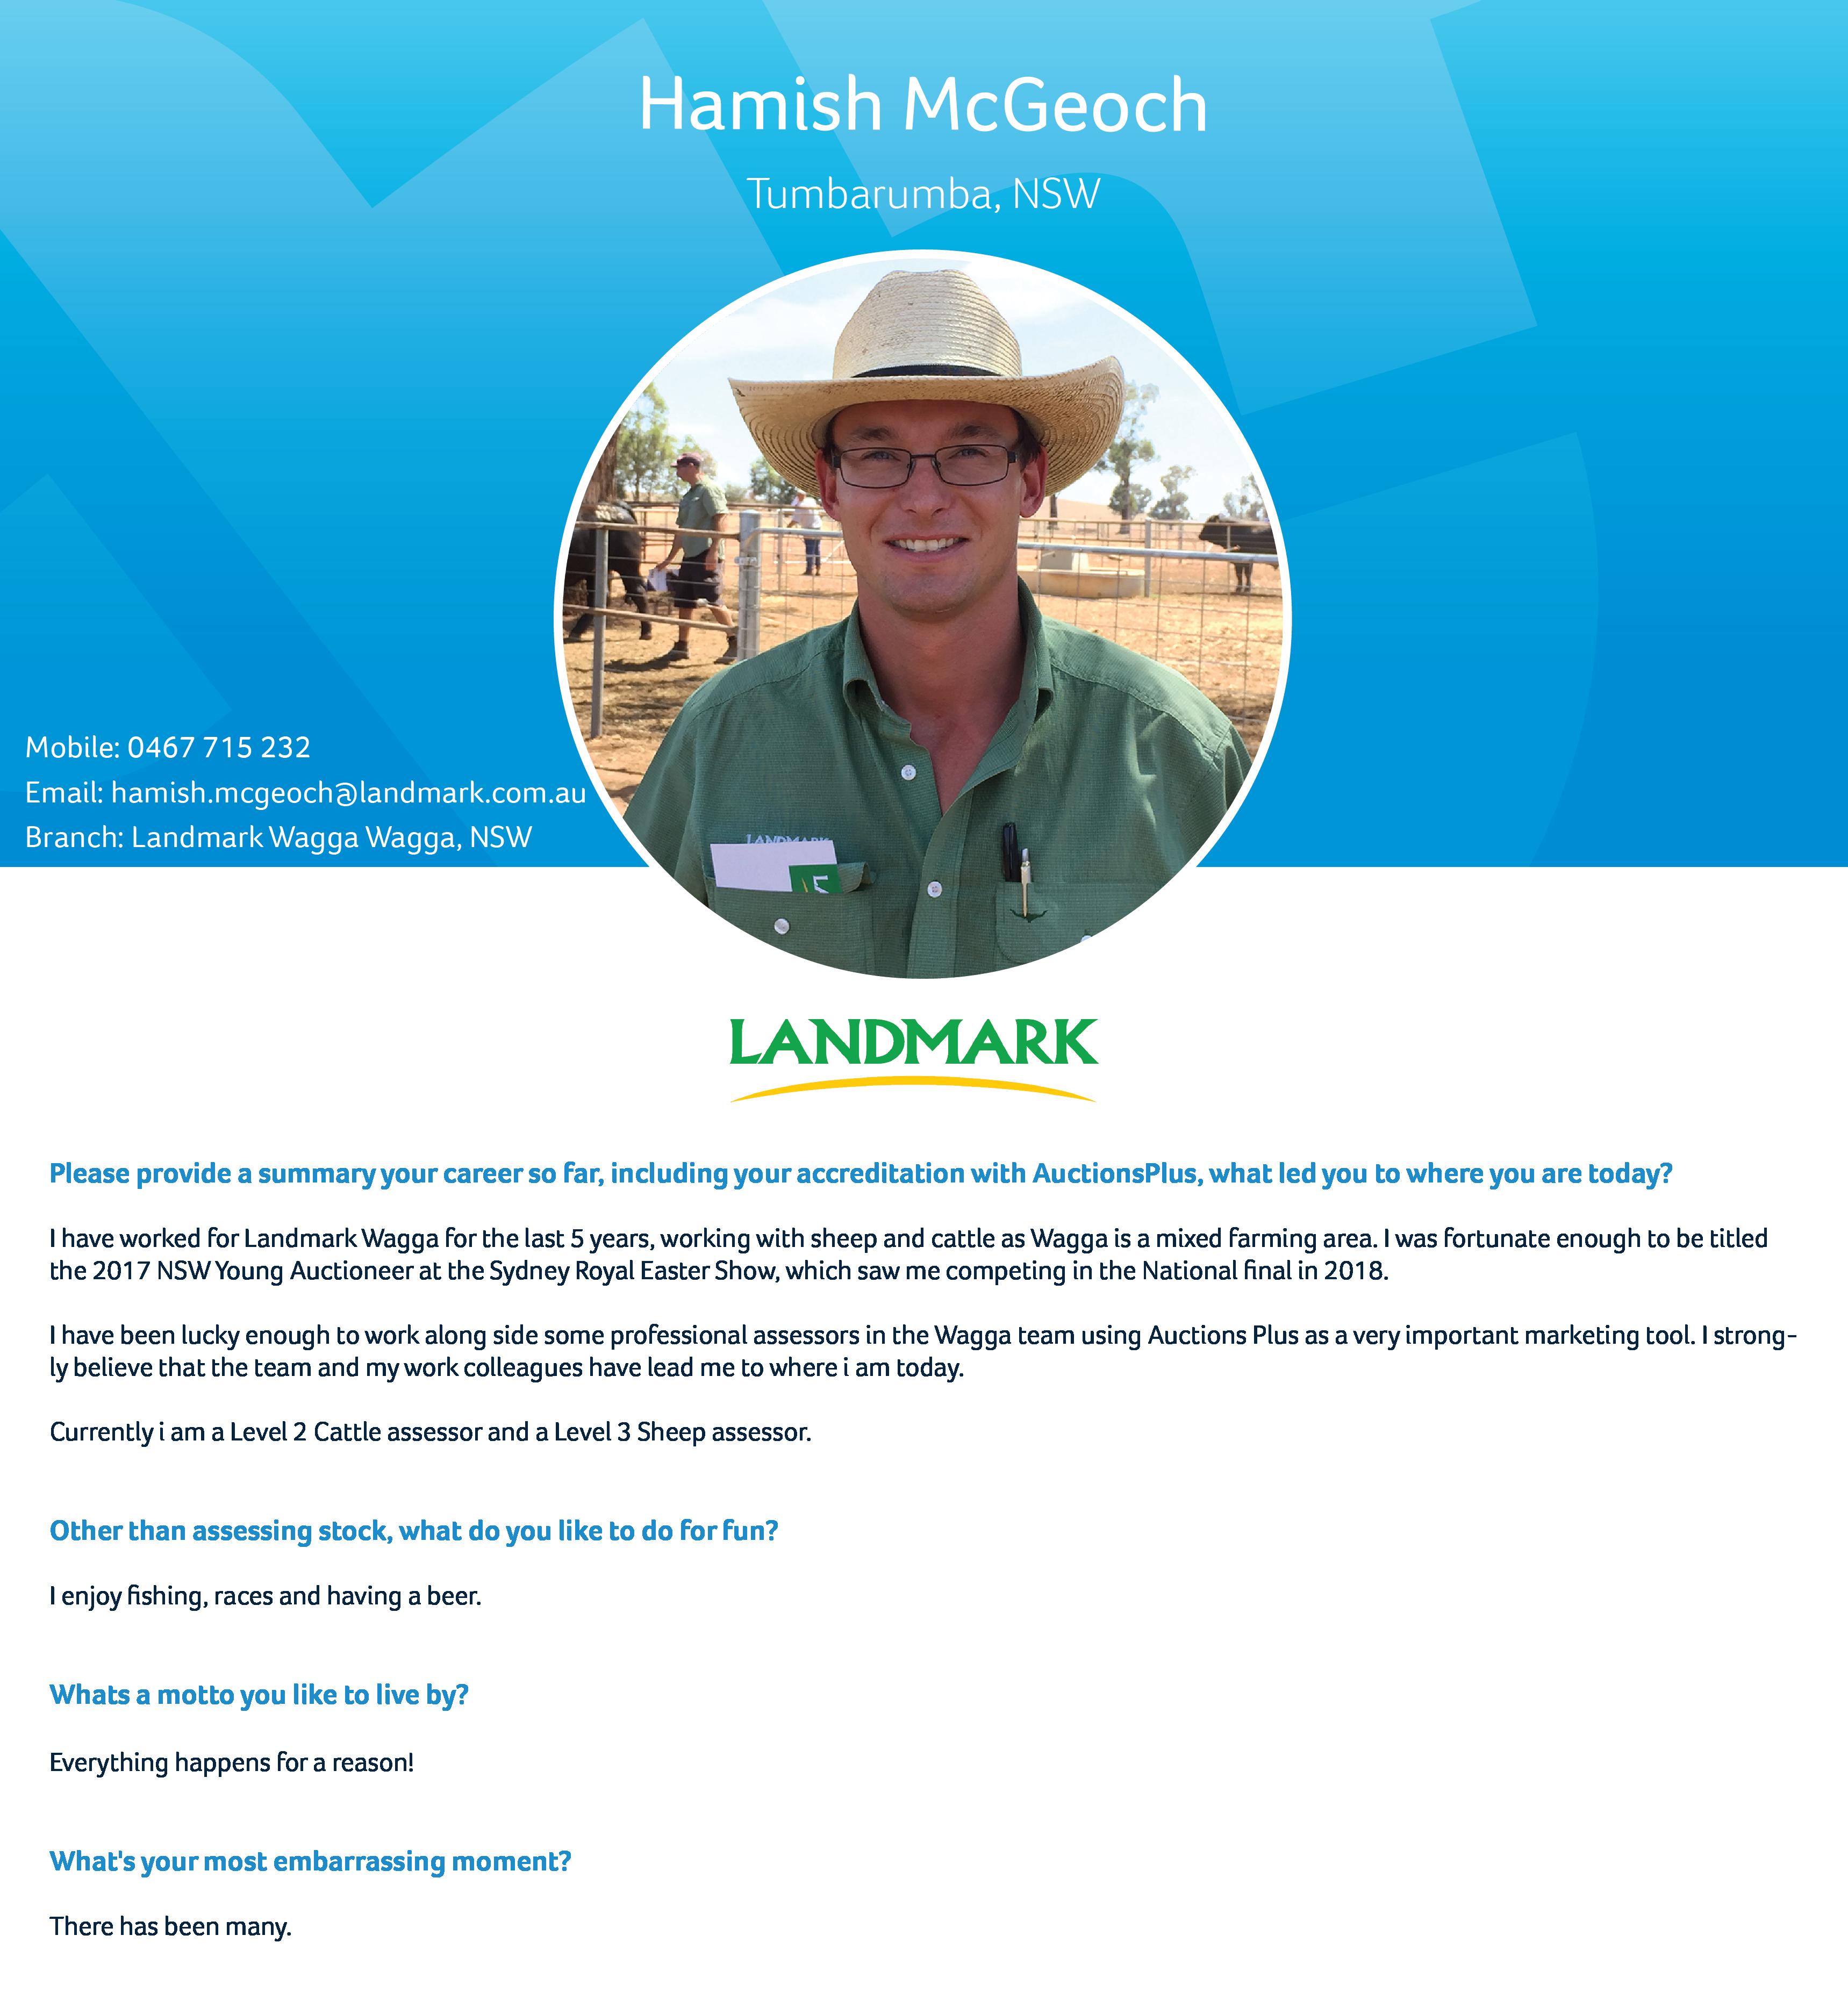 Hamish McGeoch